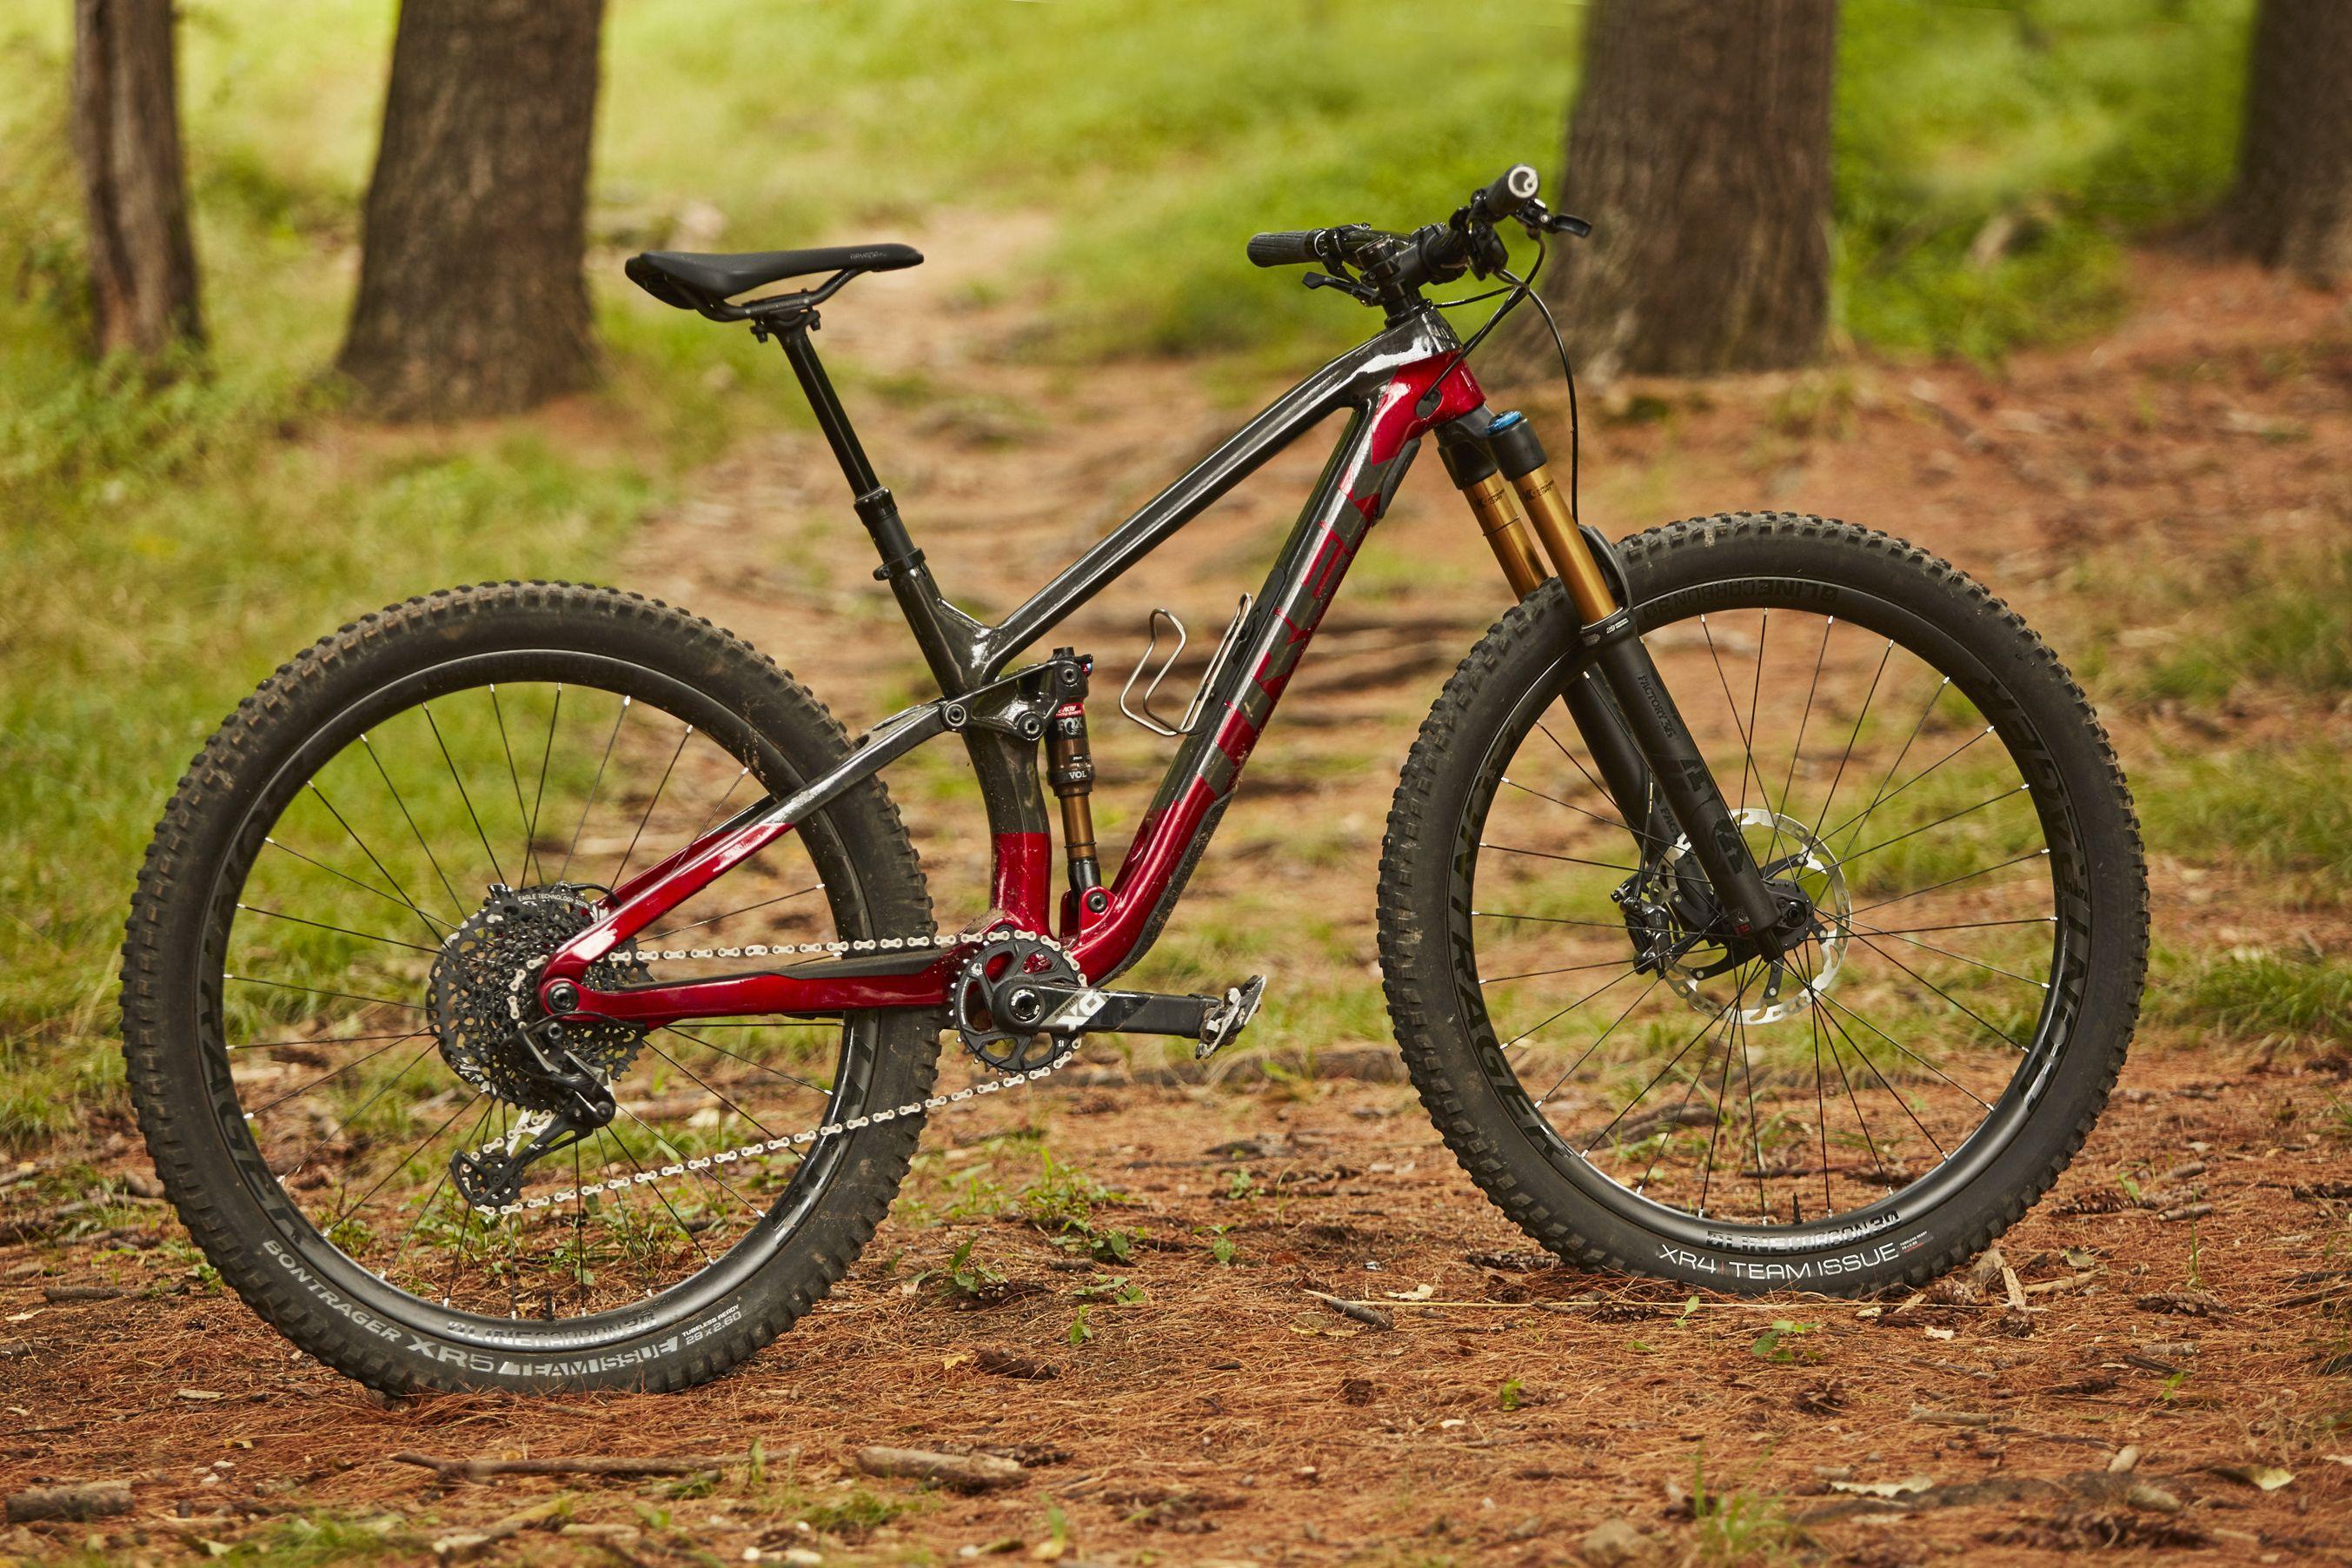 Best Bike Brands 2020 2020 Fuel EX Review   Best Mountain Bikes